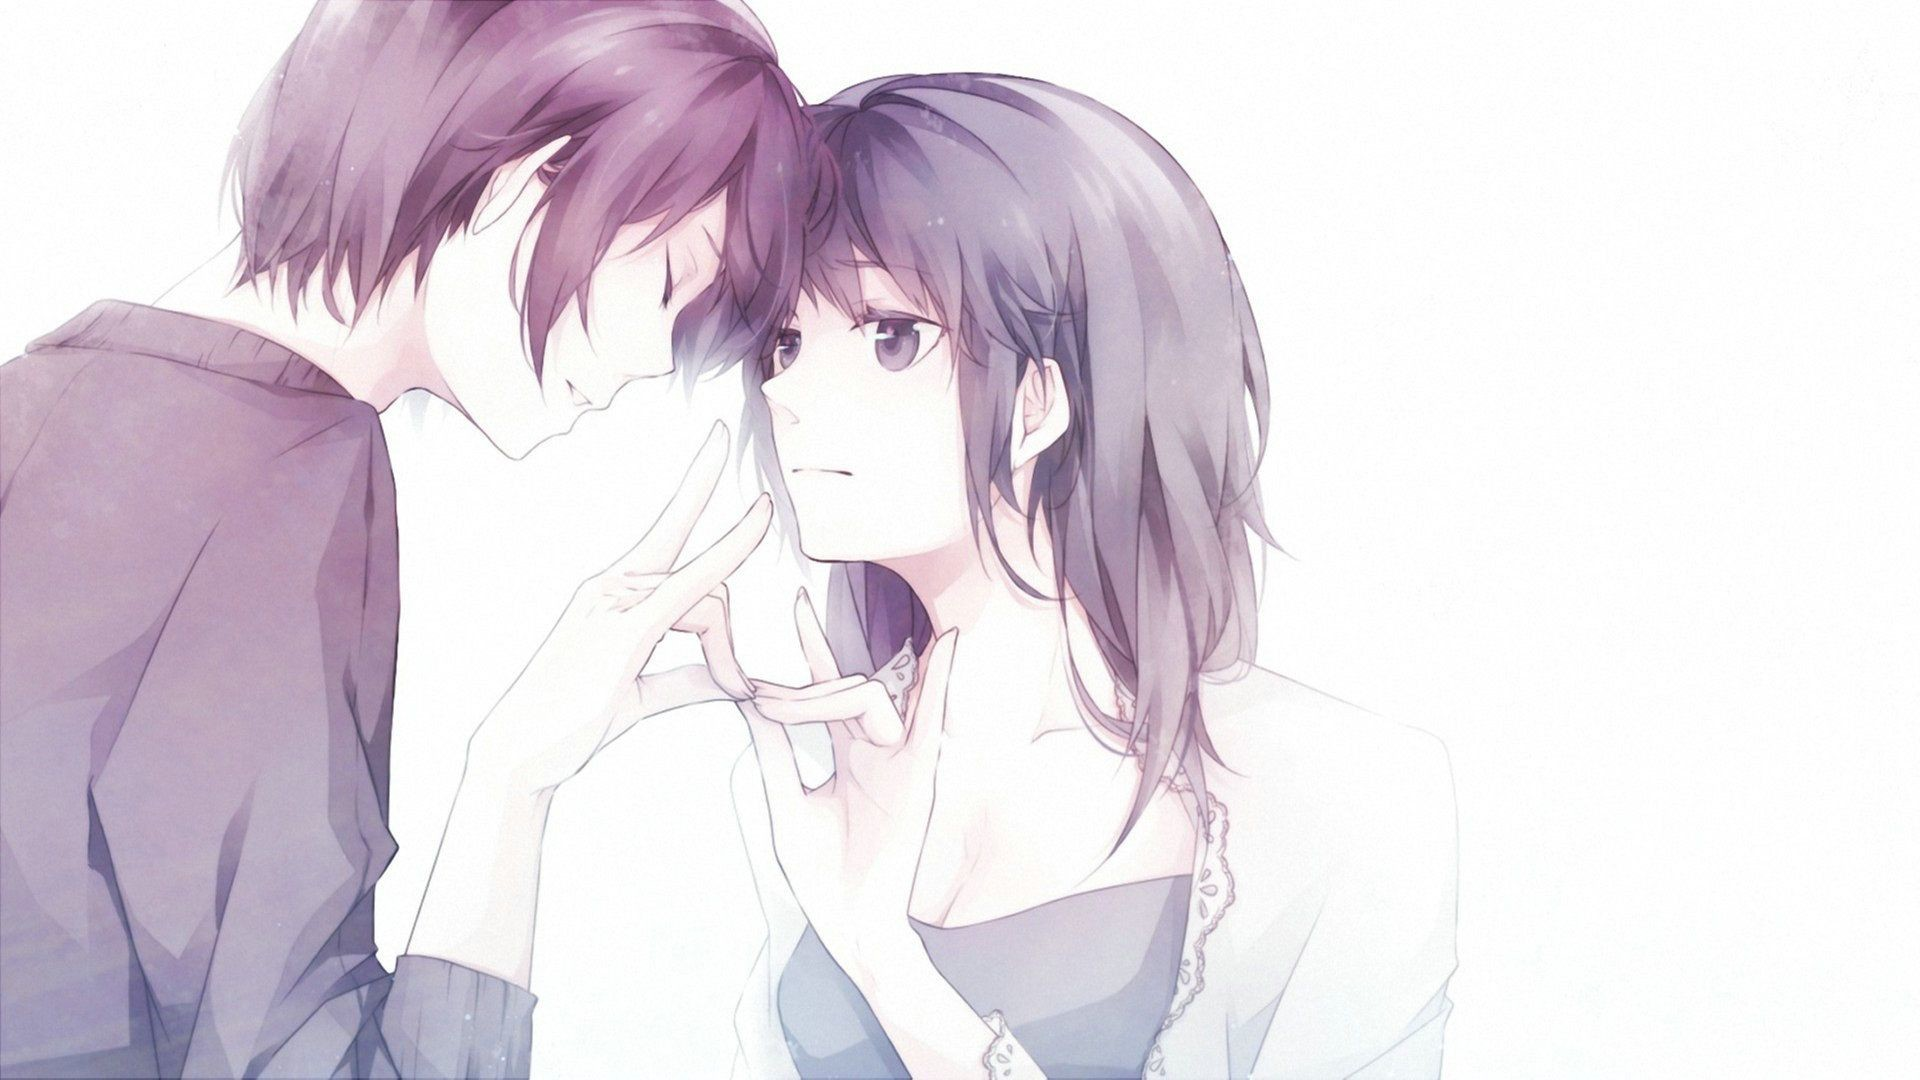 Res: 1920x1080, Anime Couple Wallpaper (24)